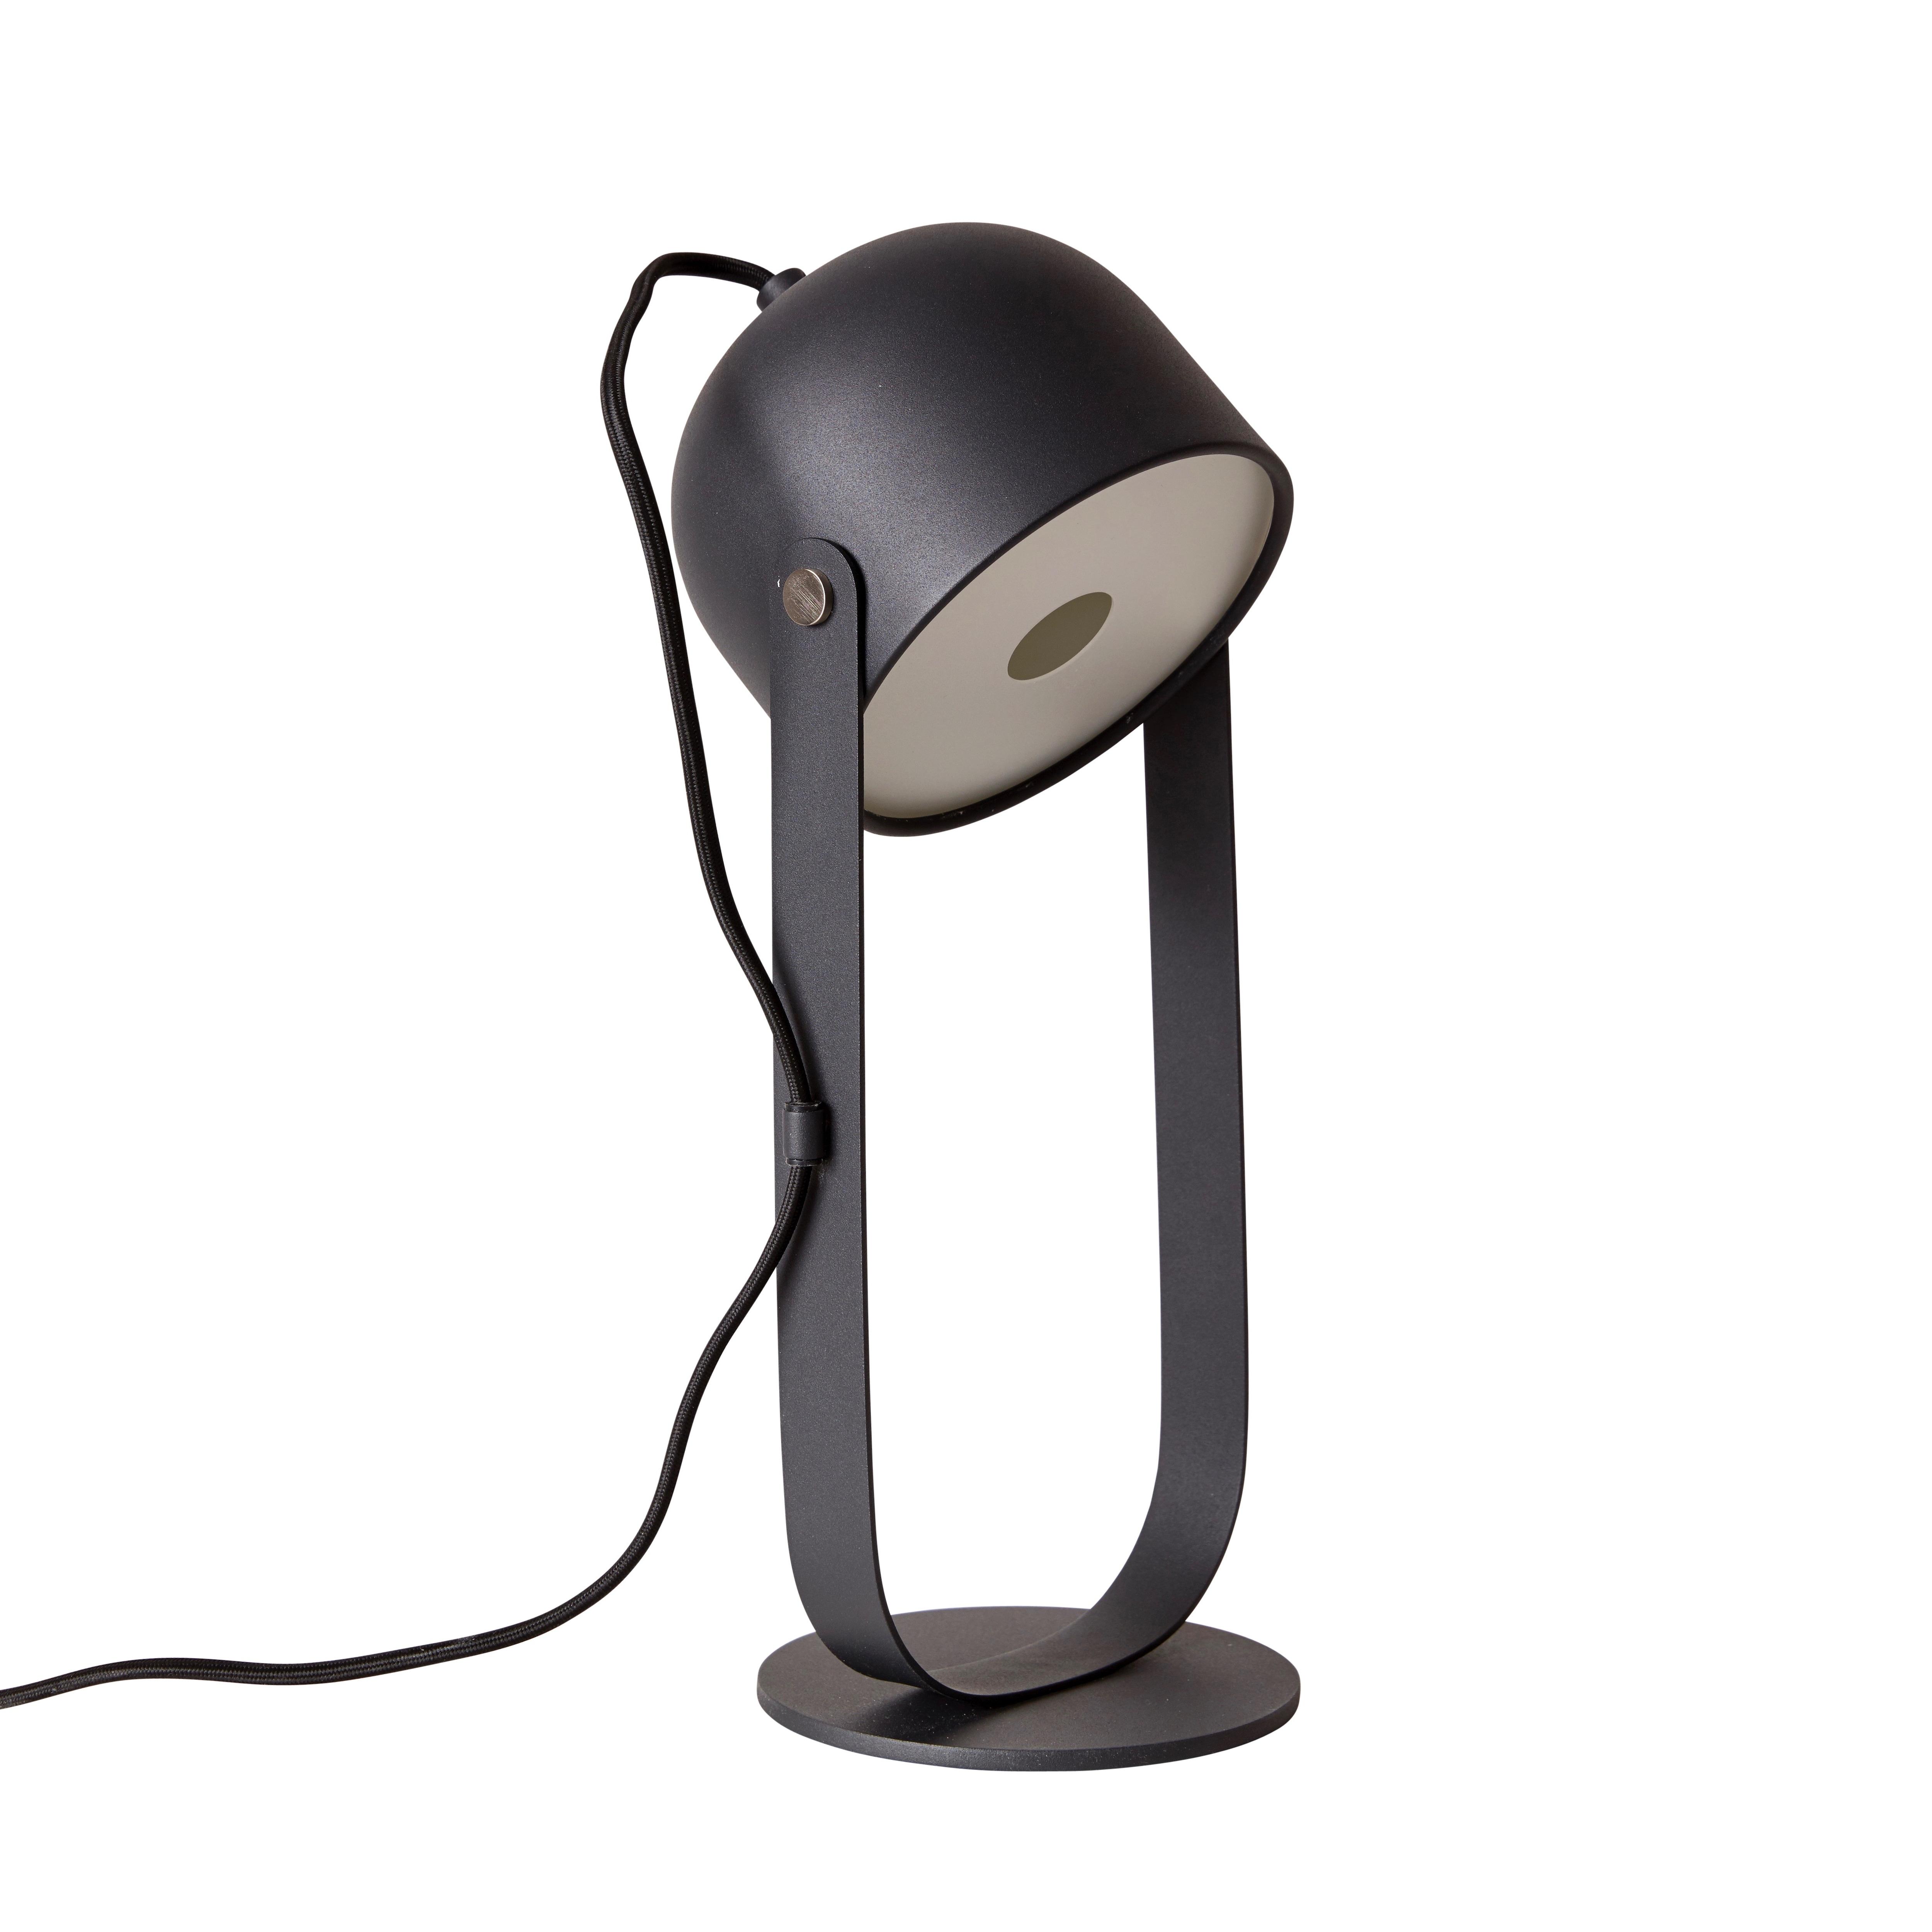 Svejk 13 bordslampa svart